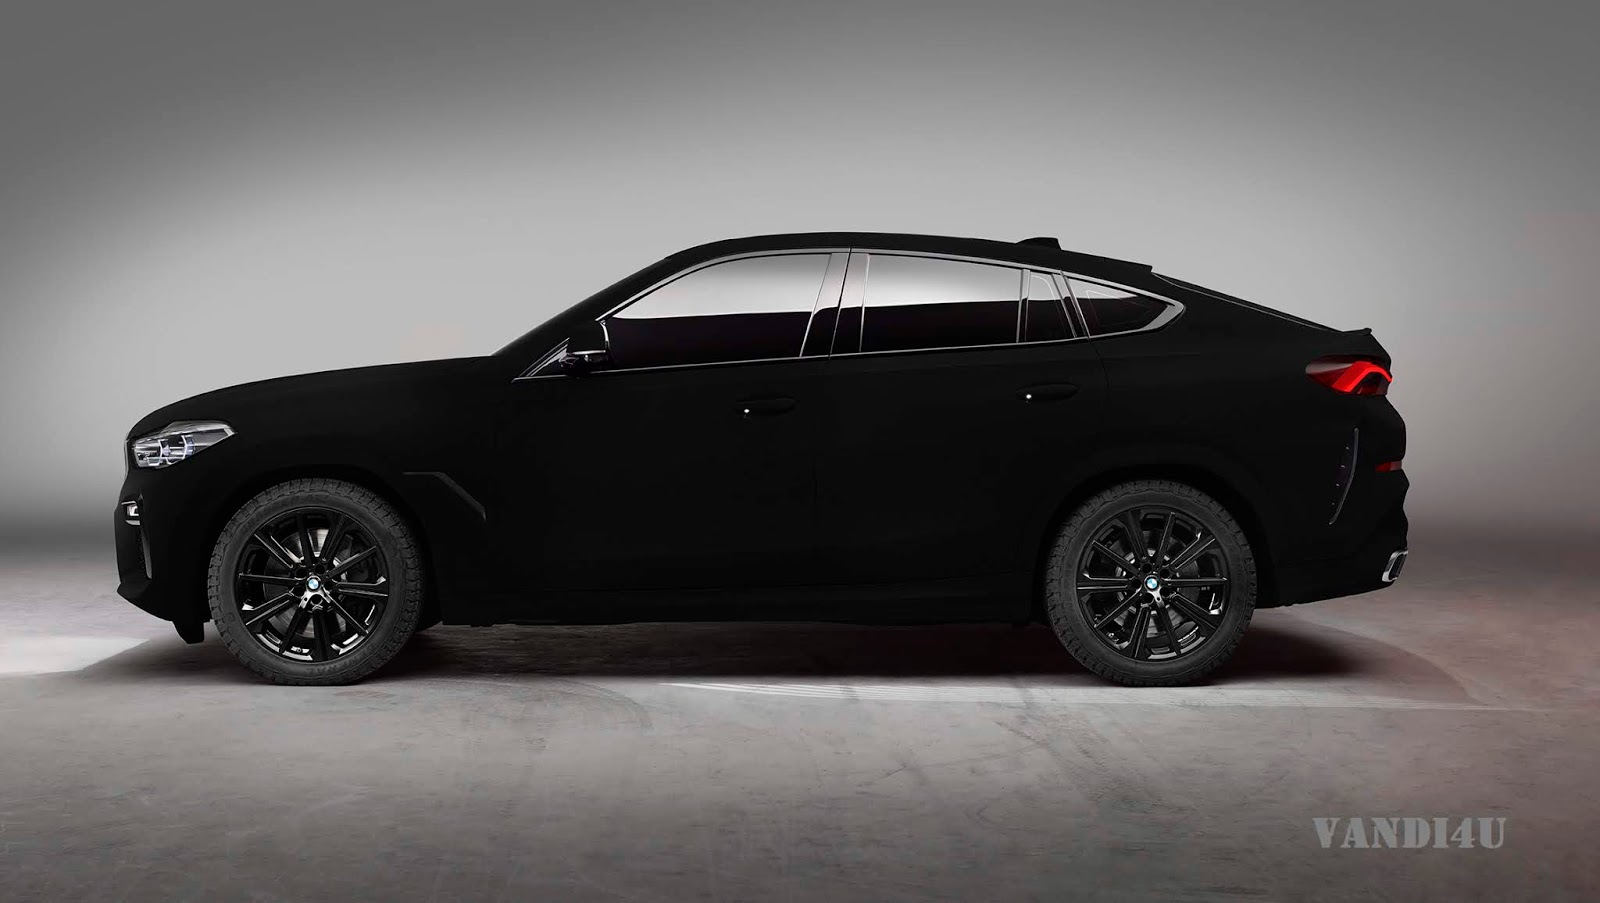 BMW Revealed The World's Blackest Black Car - X6 Vantablack | VANDI4U